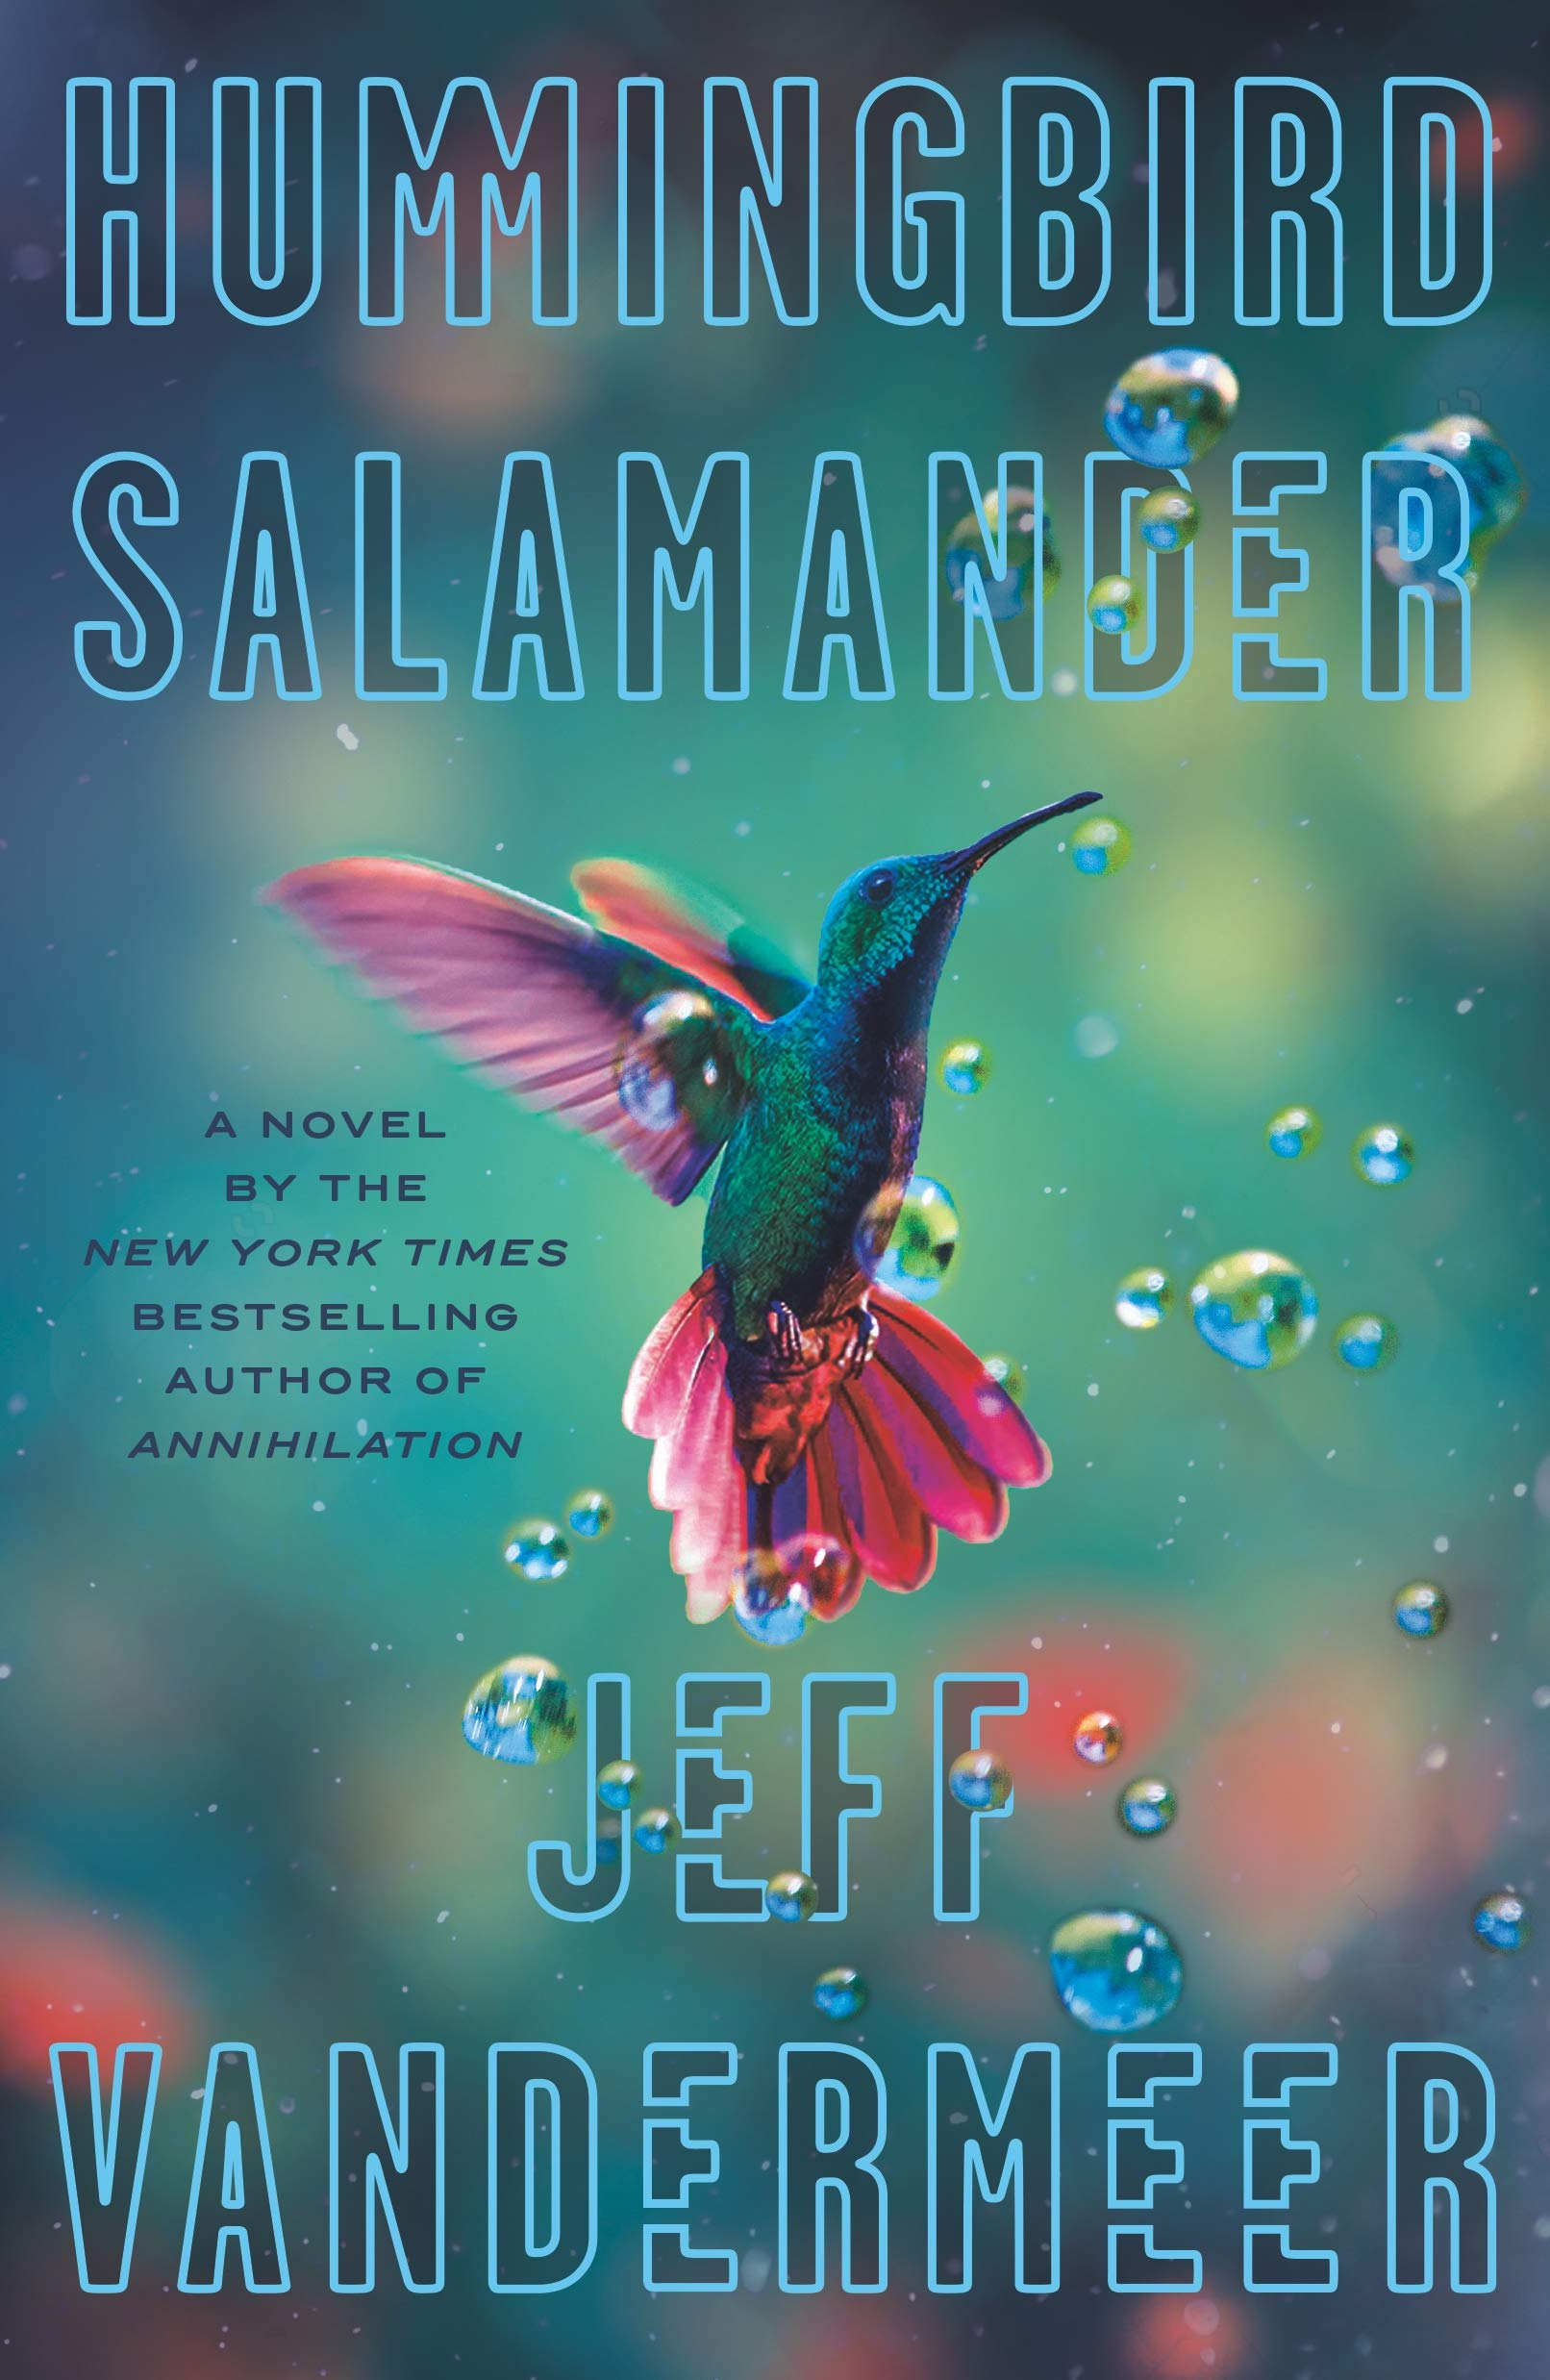 Hummingbird Salamander - Cover